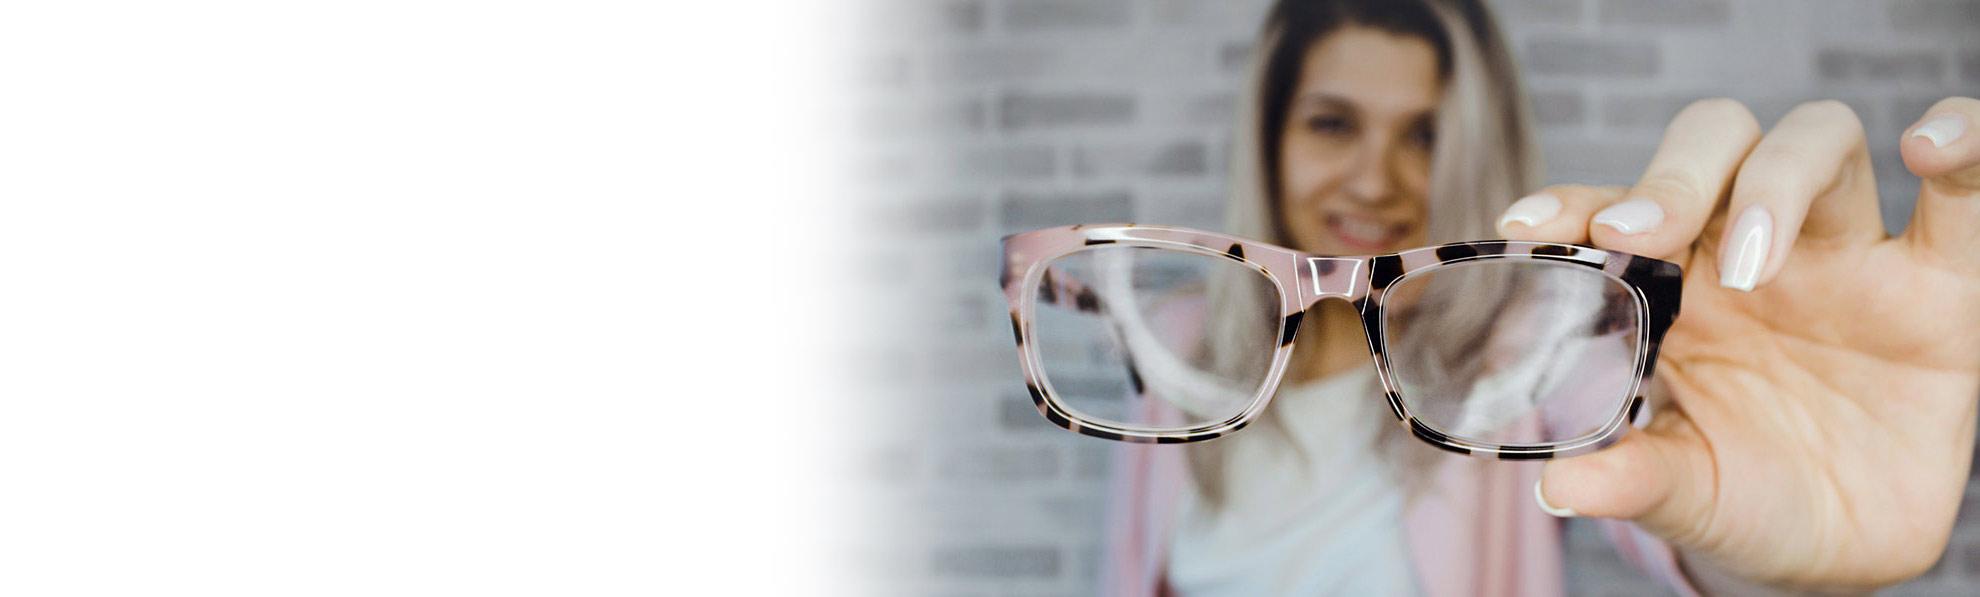 Myopia, hyperopia and astigmatism